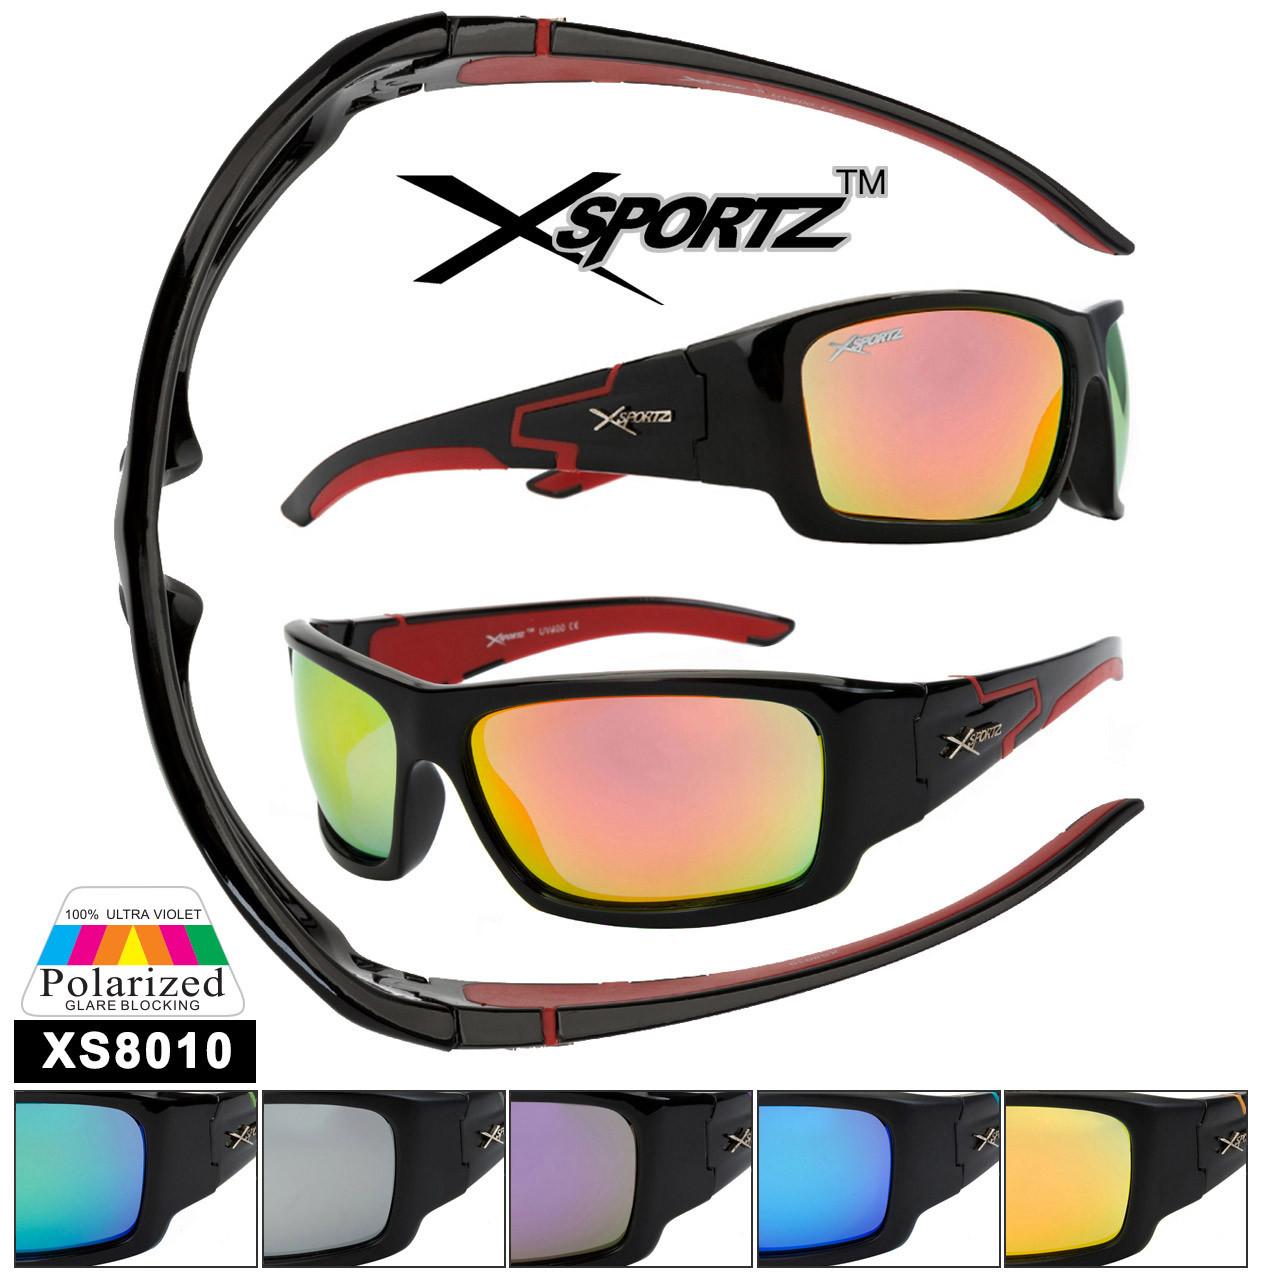 Polarized Xsportz™ Wholesale Sunglasses  - Style XS8010 (Assorted Colors) (12 pcs.)